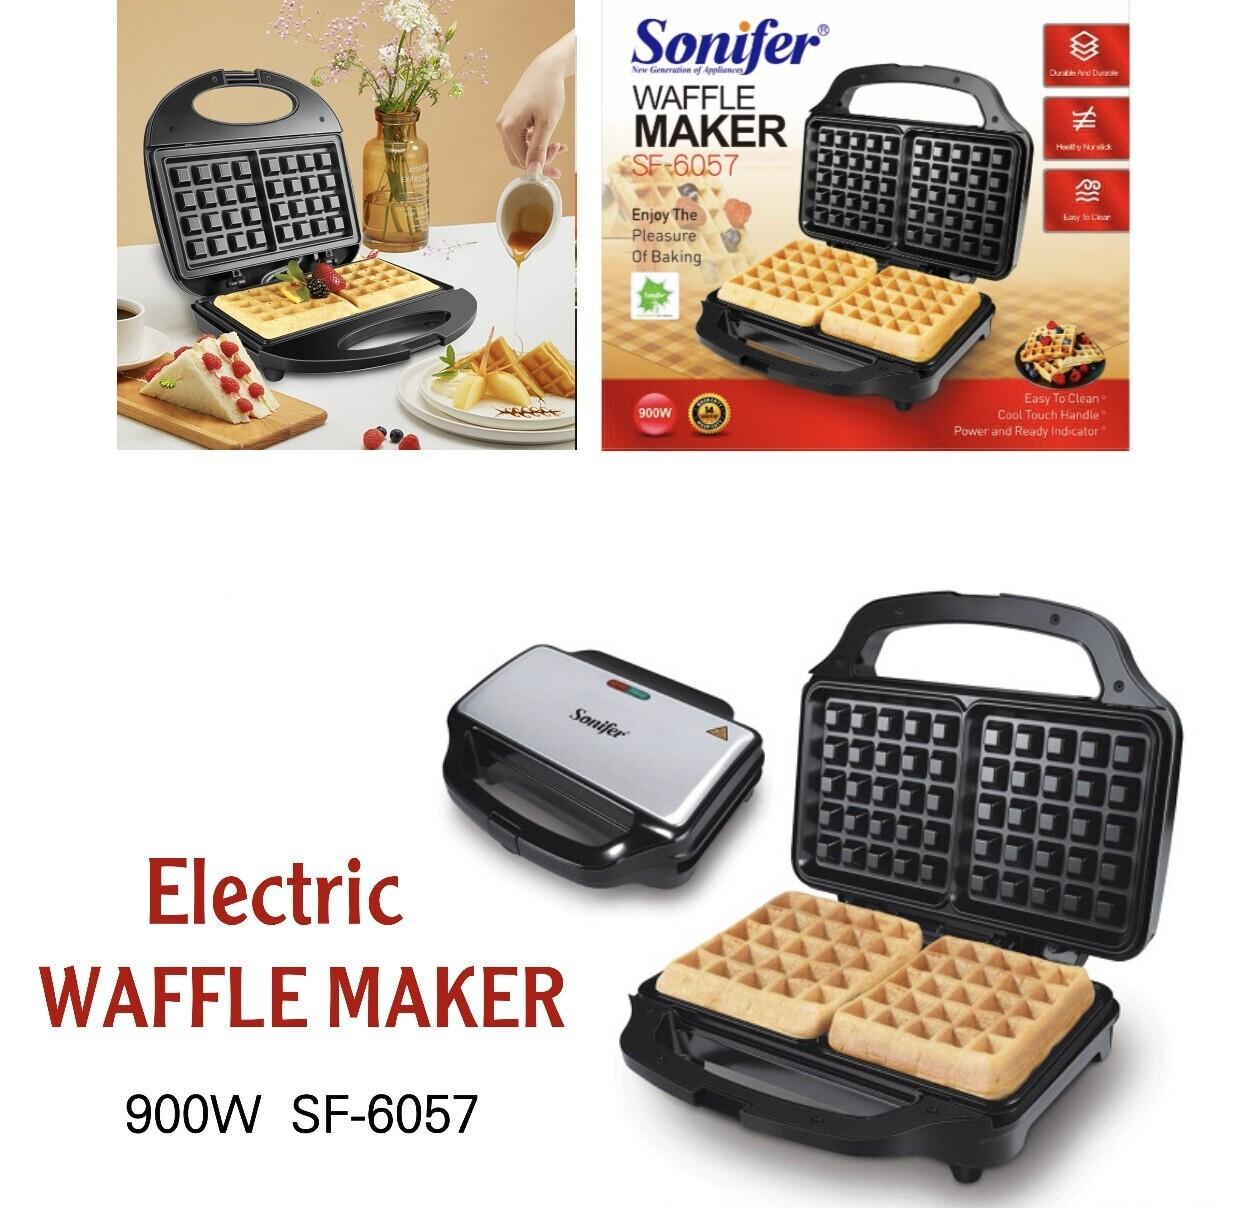 Waffle Maker (SF-6057)